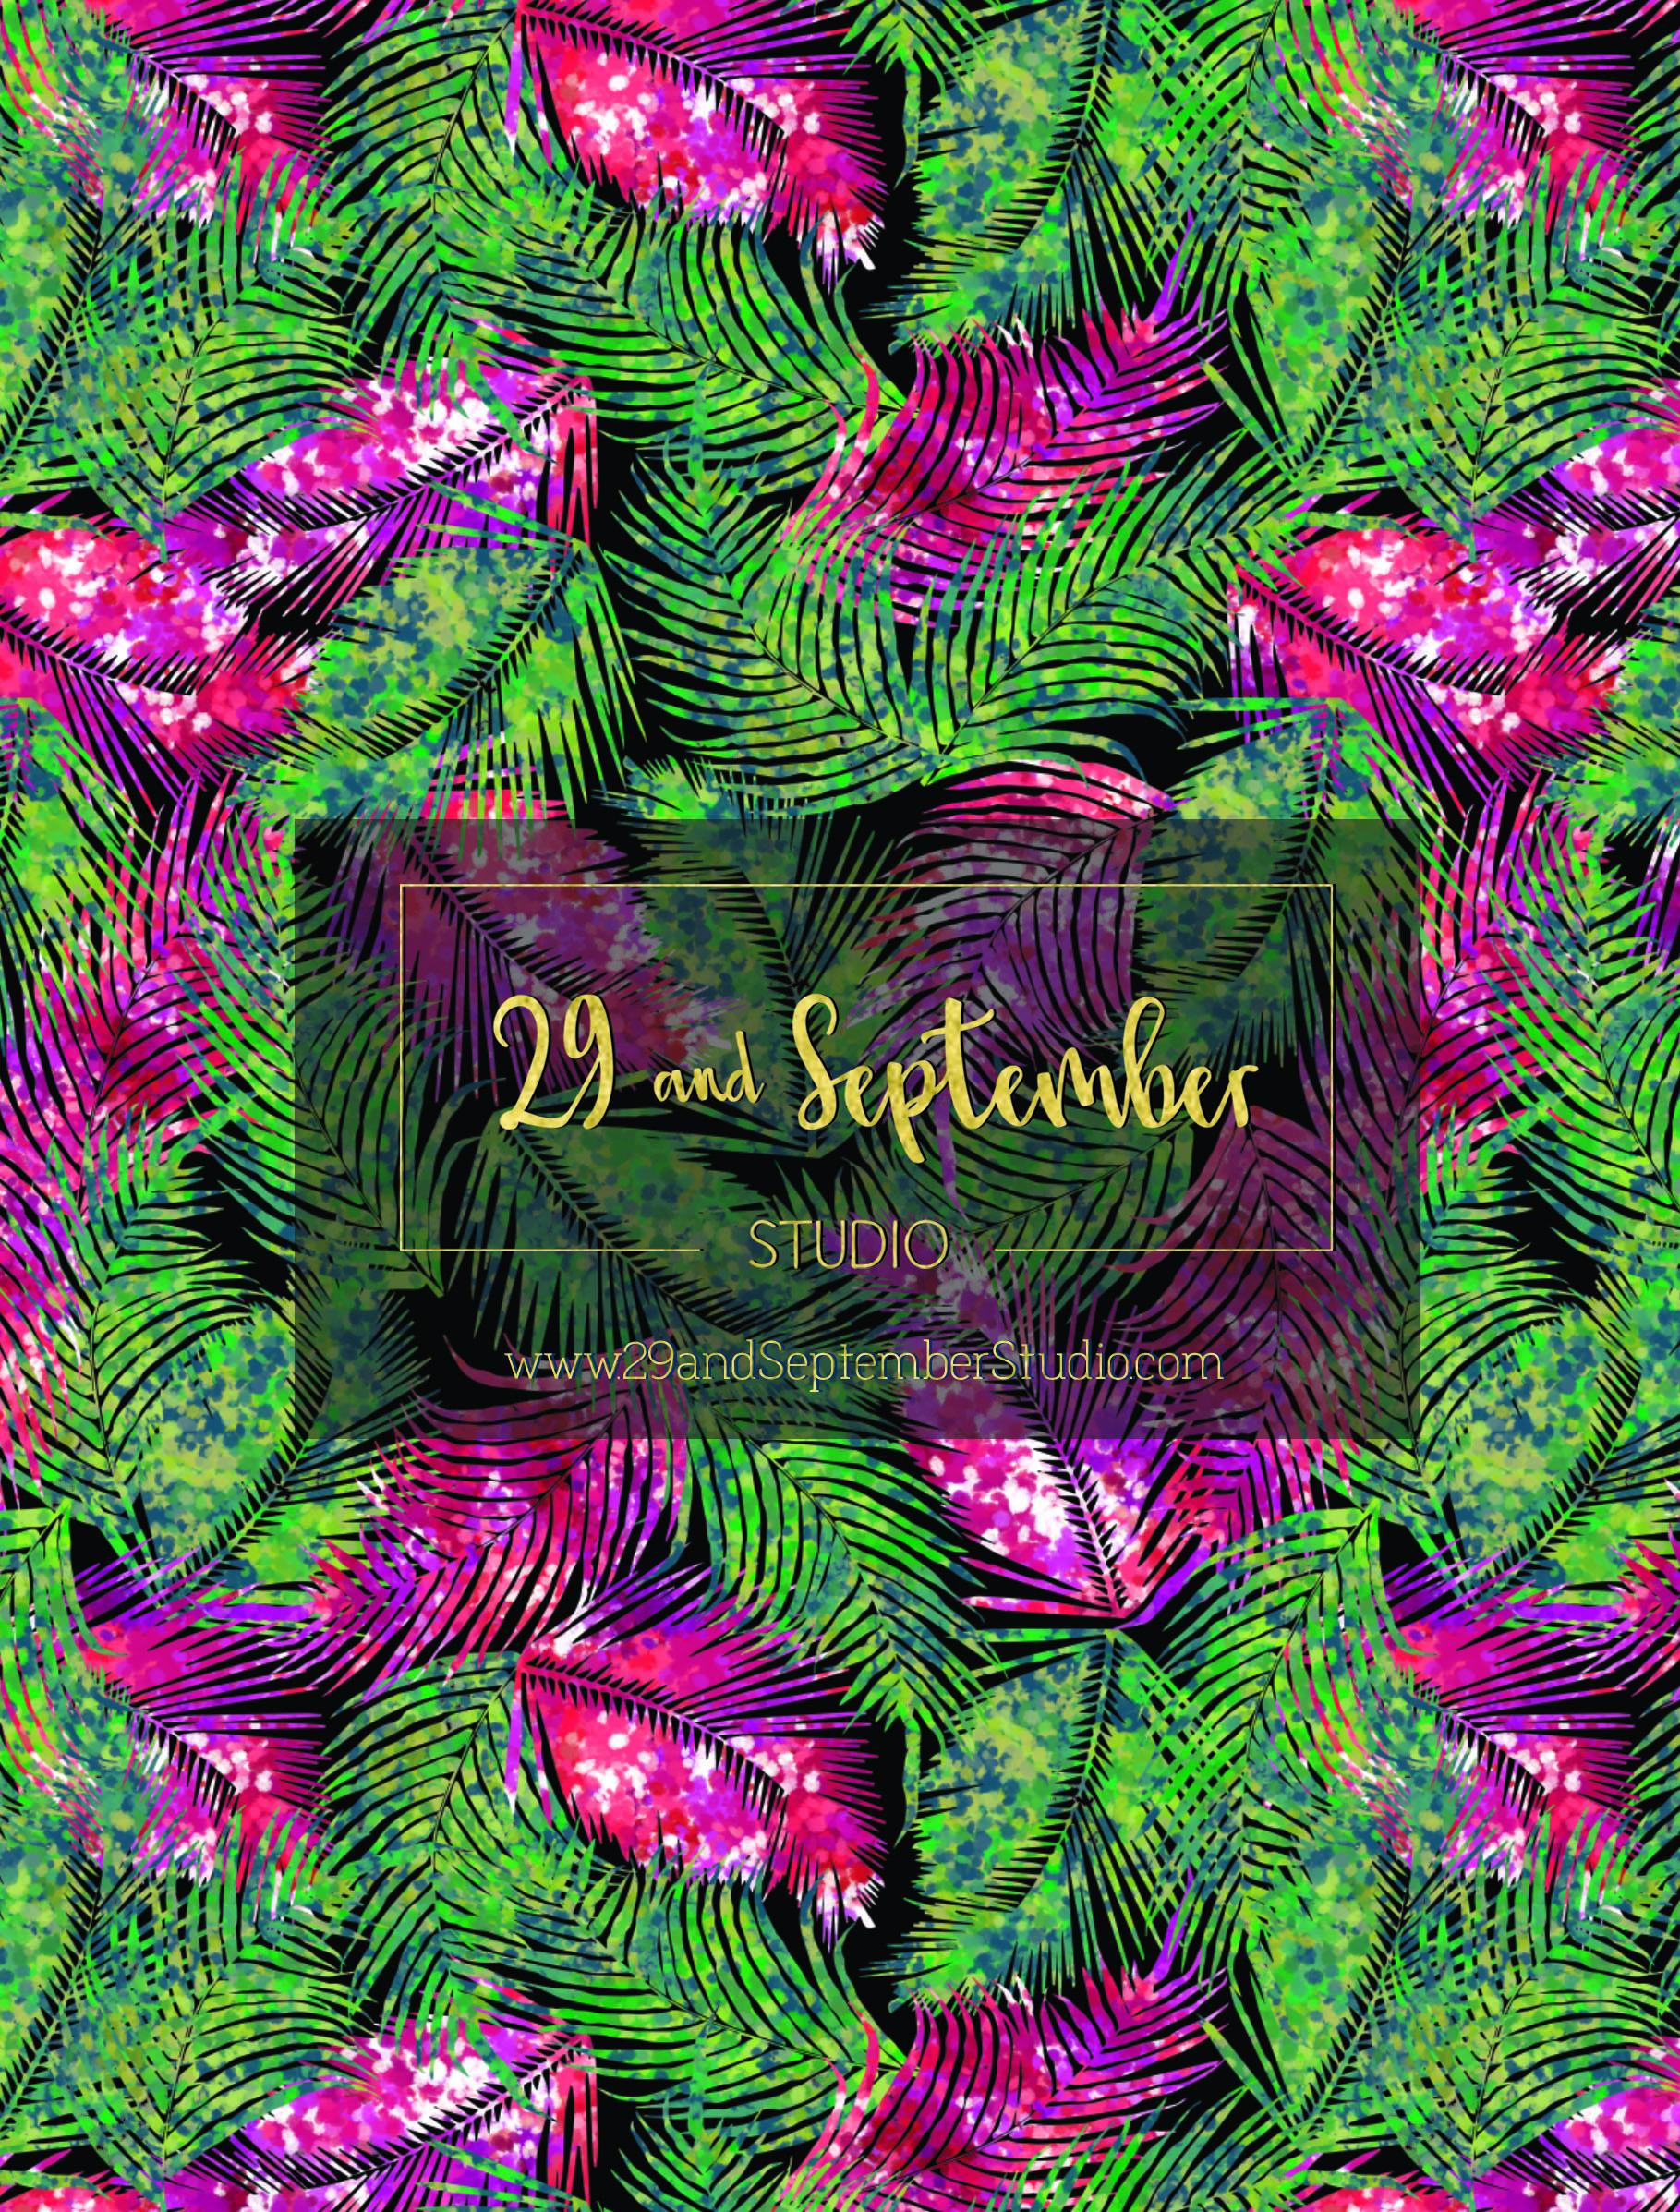 Textile print design by 29andSeptember Studio